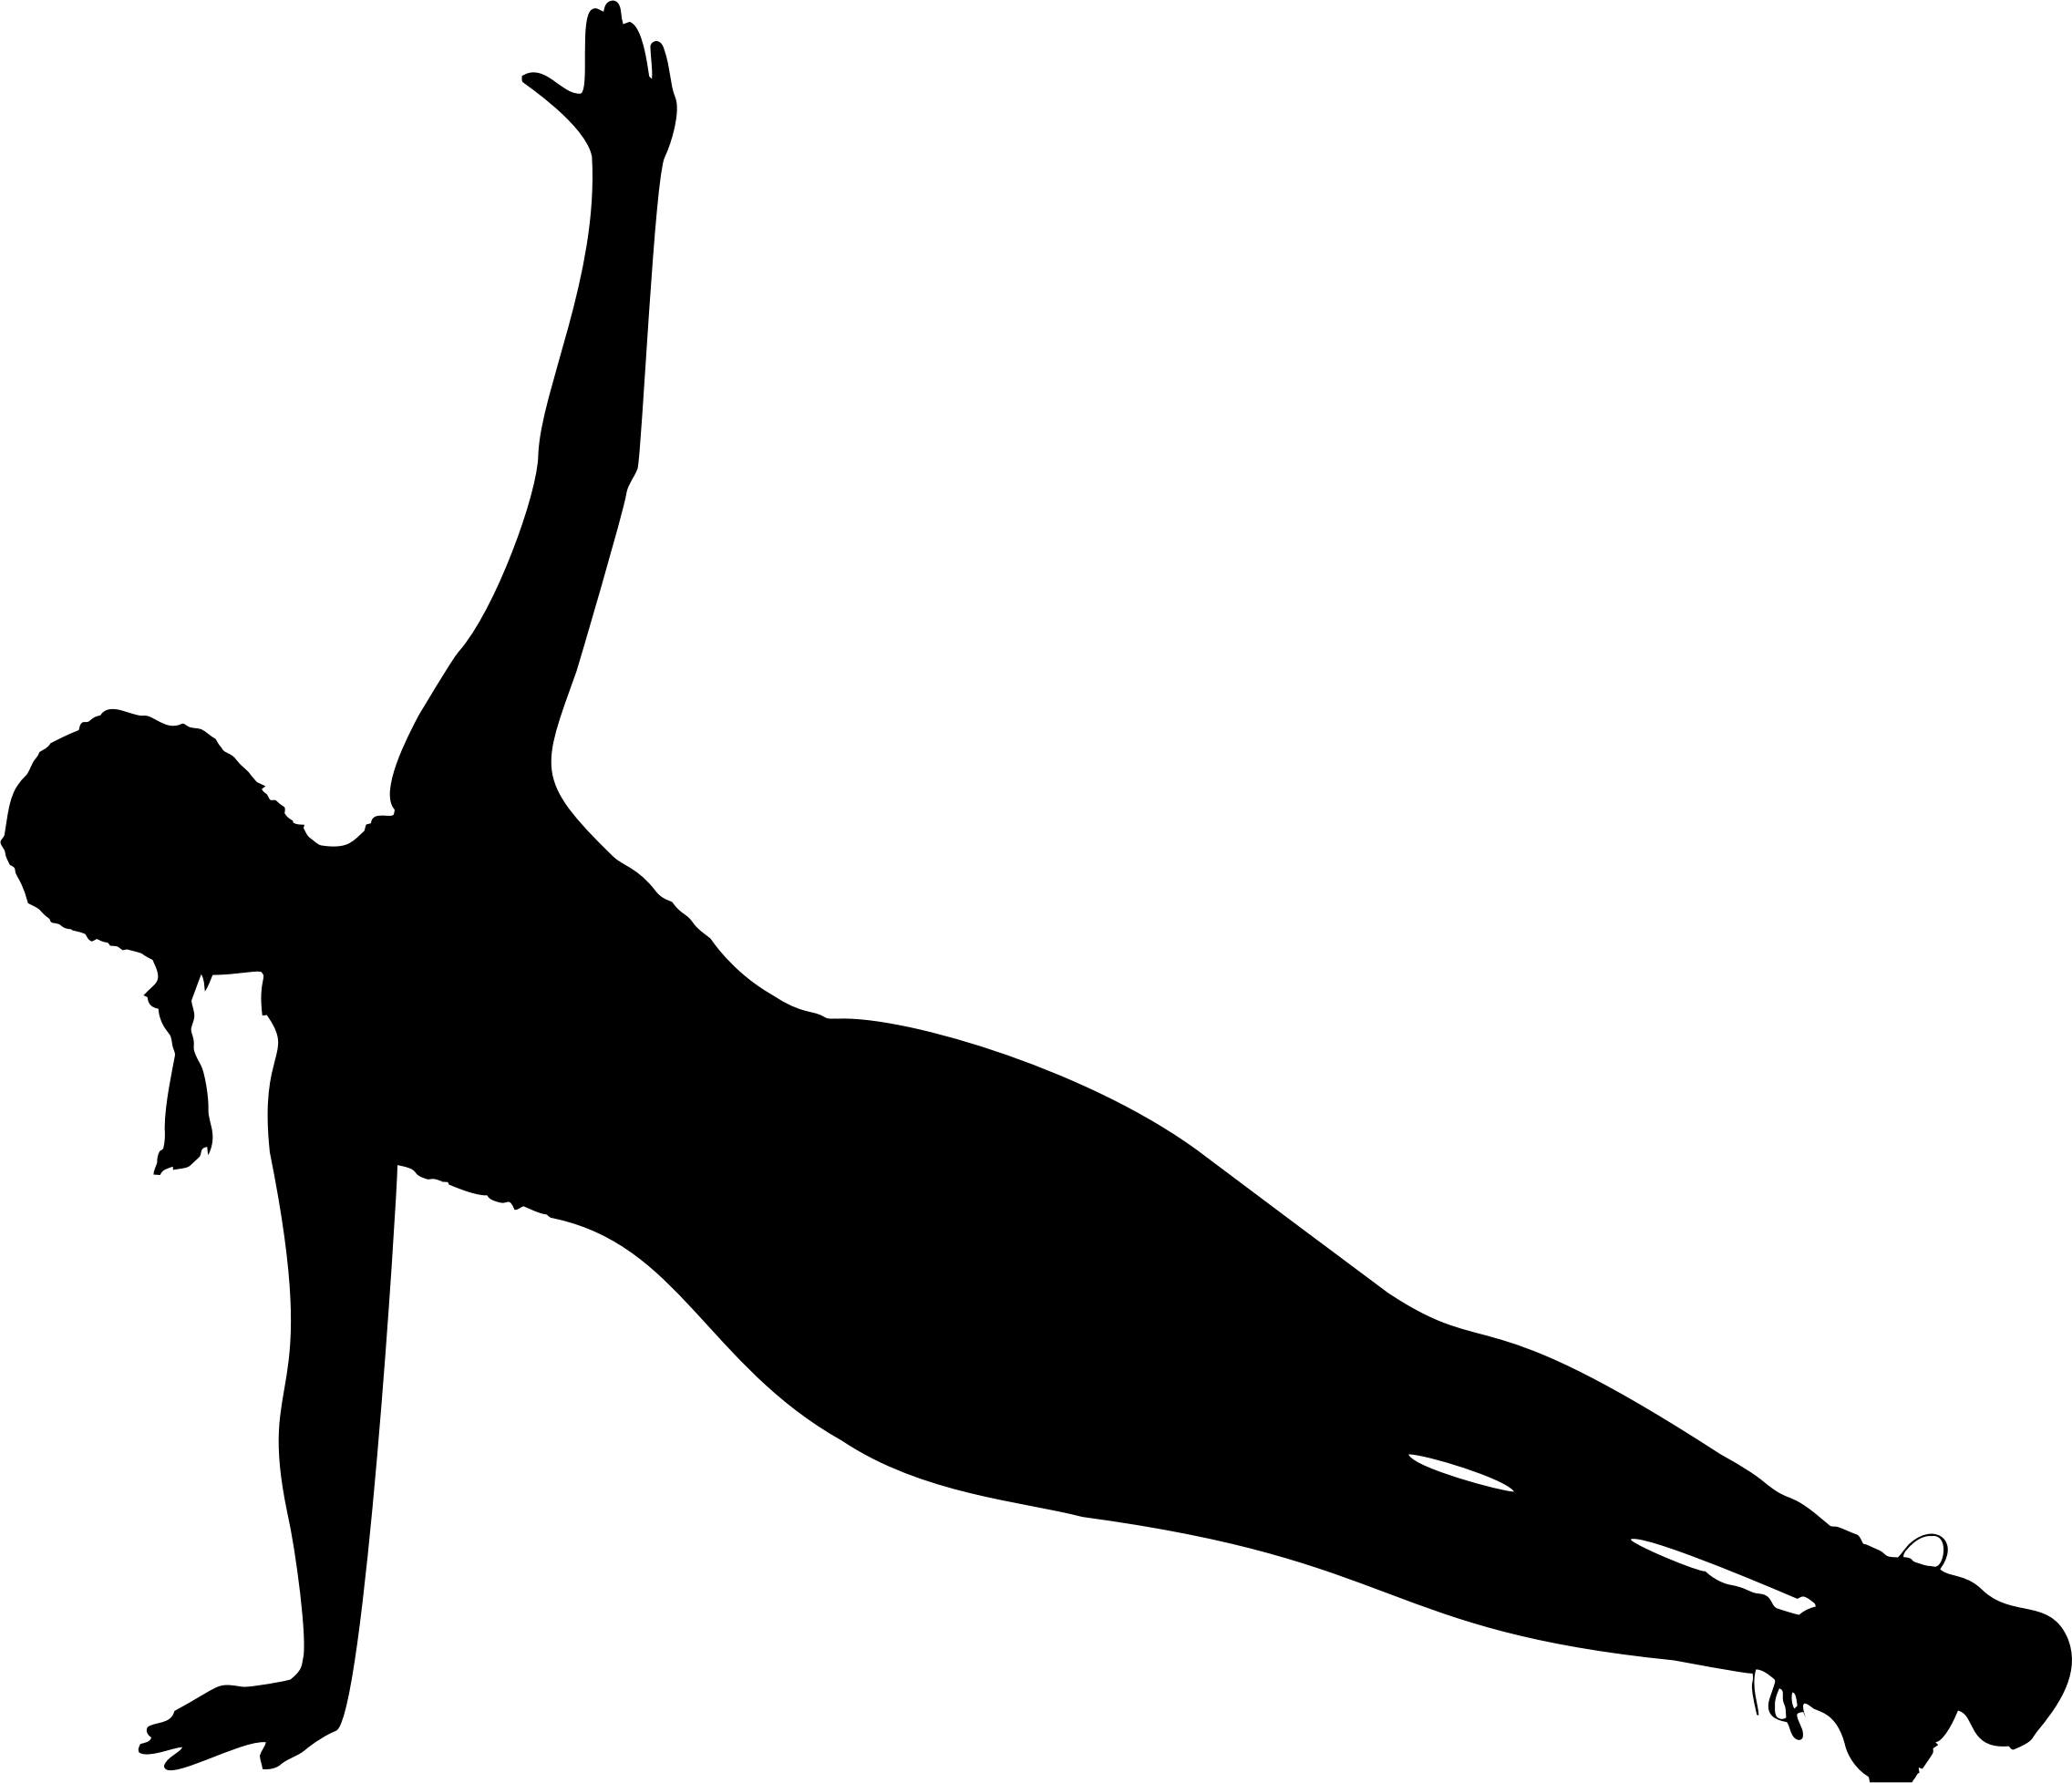 2273x1956 Clipart